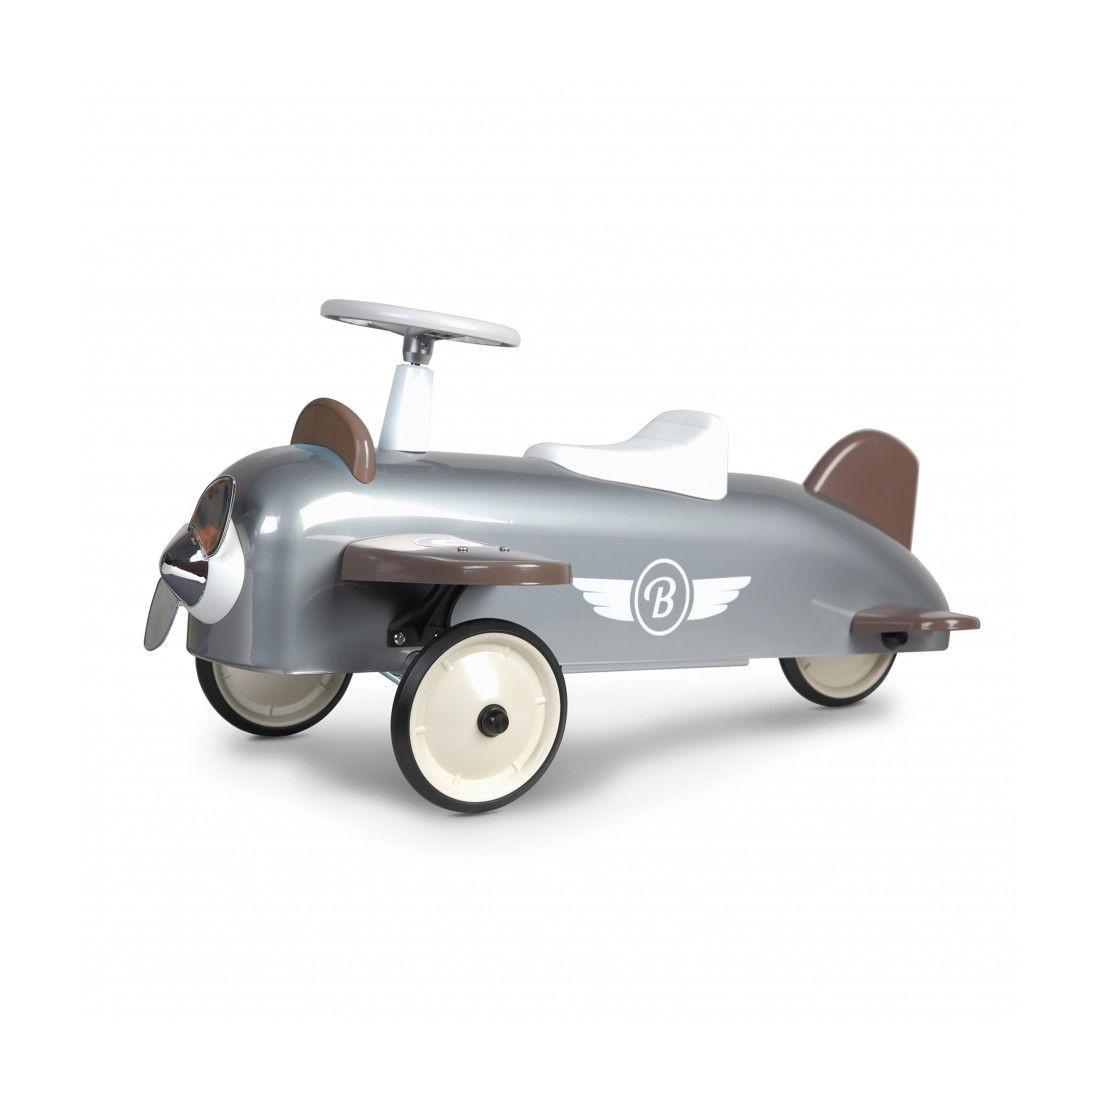 Speedster Avion - Baghera